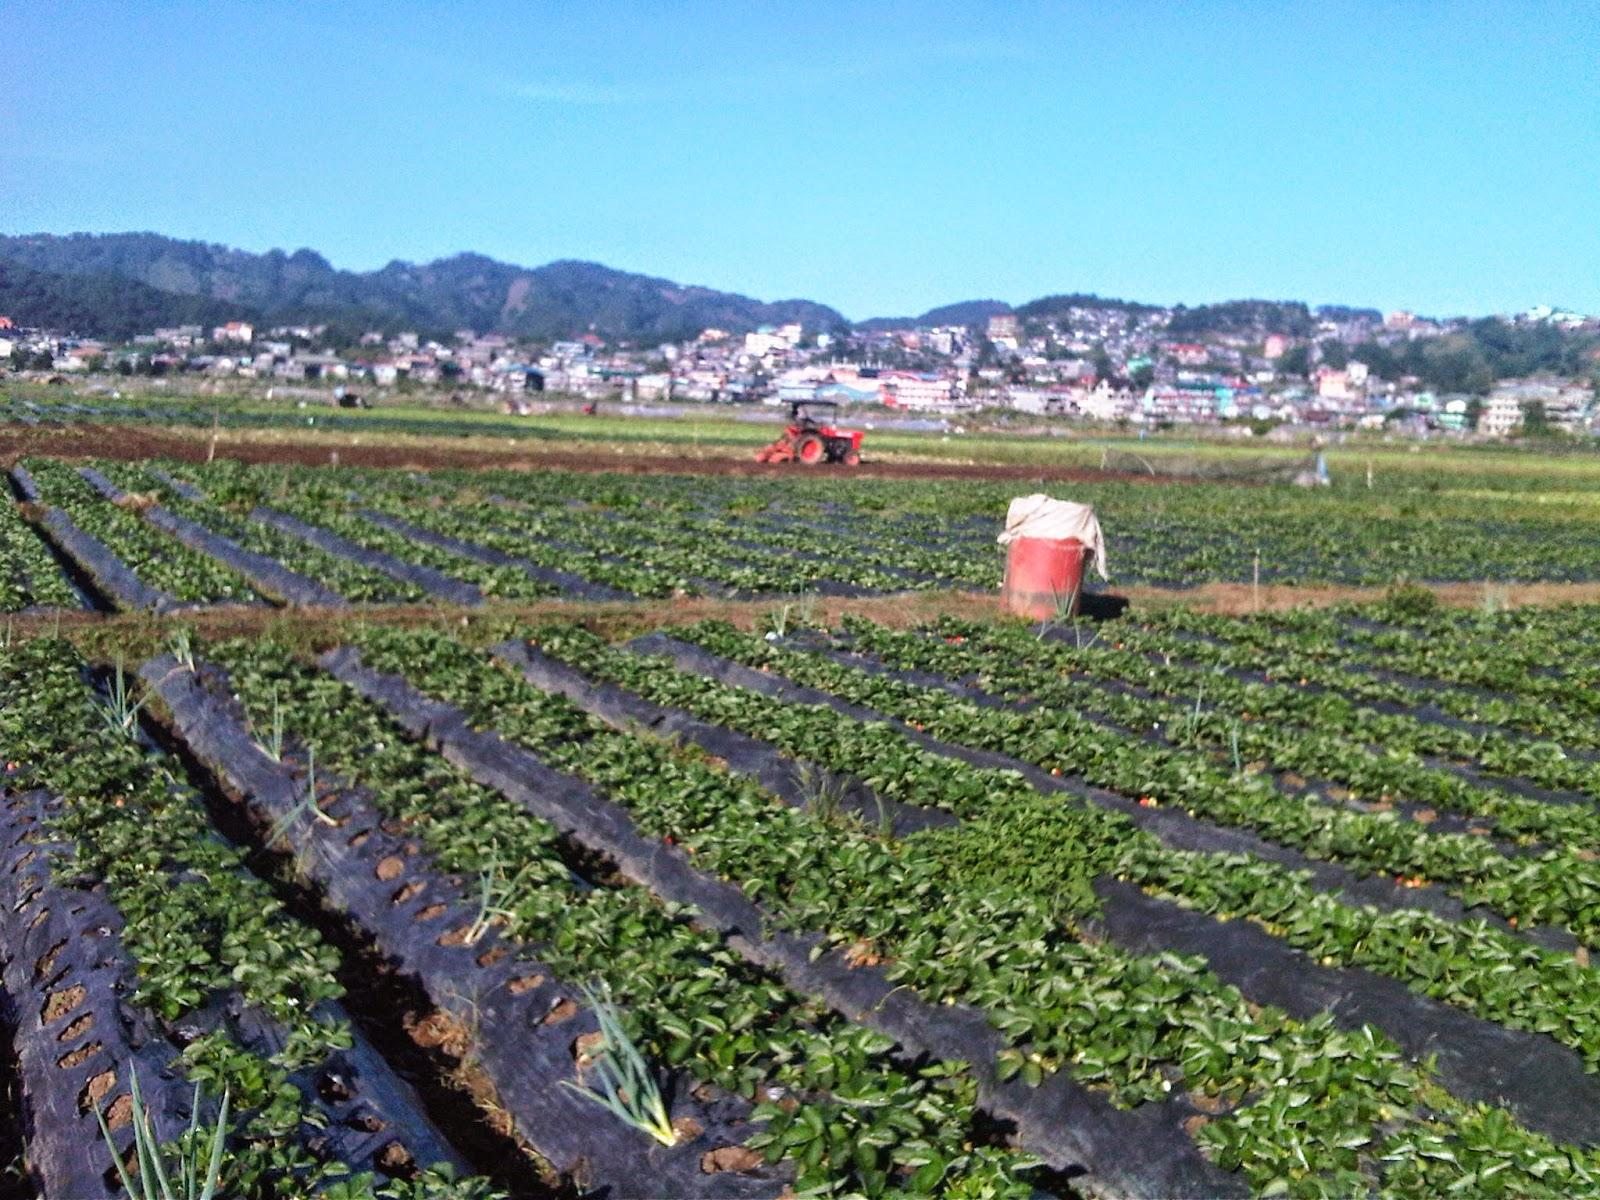 Where to go in Baguio? Strawberry Farm